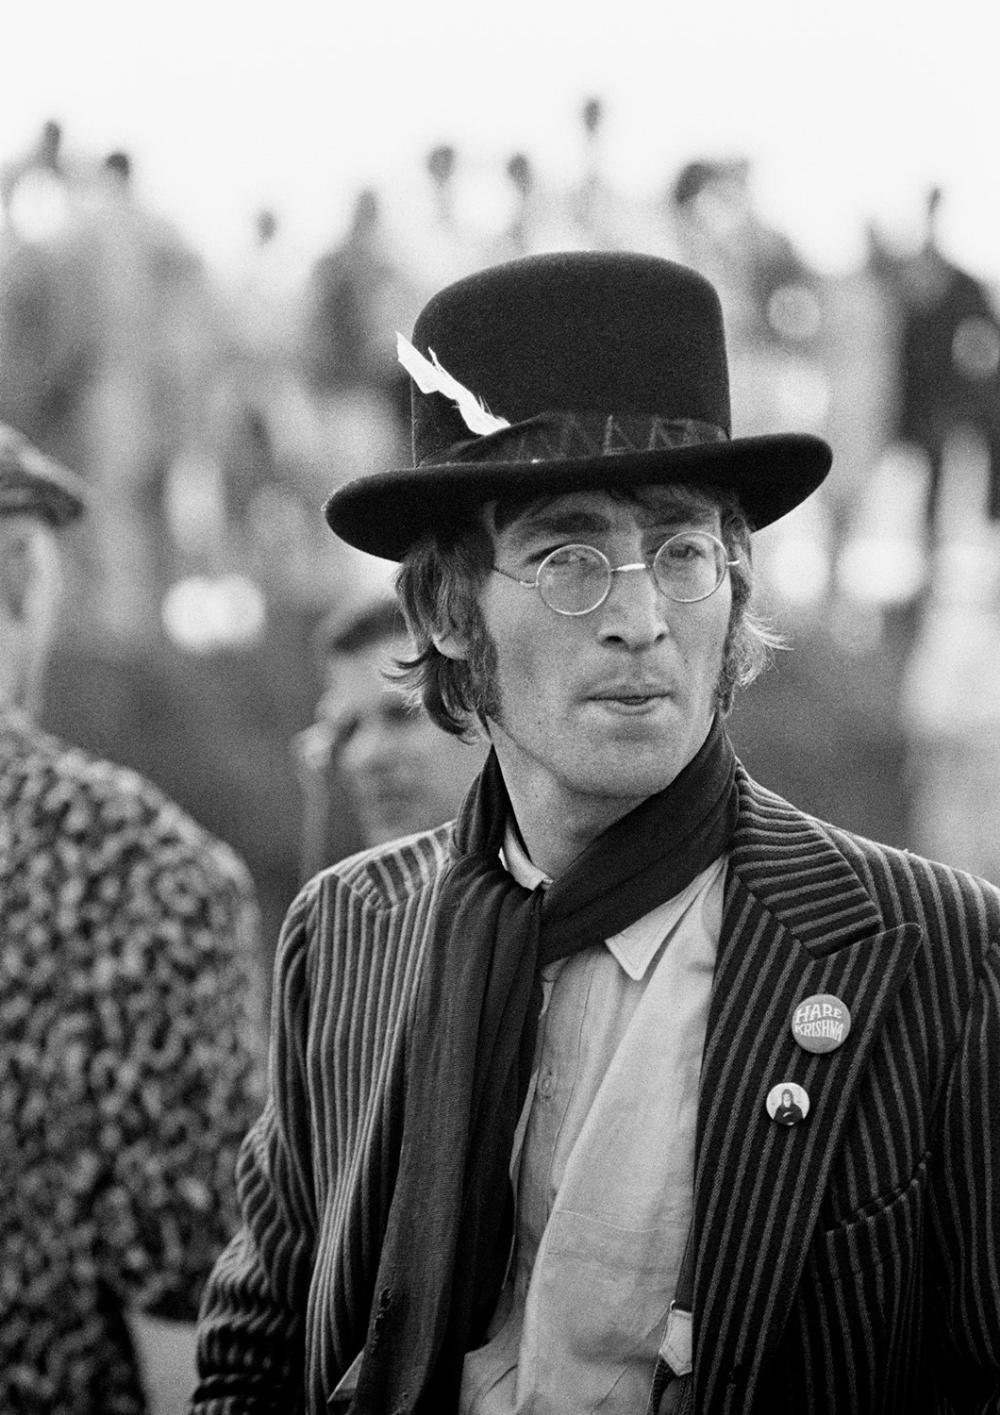 John Lennon 1967 Decorative Collective in 2020 John